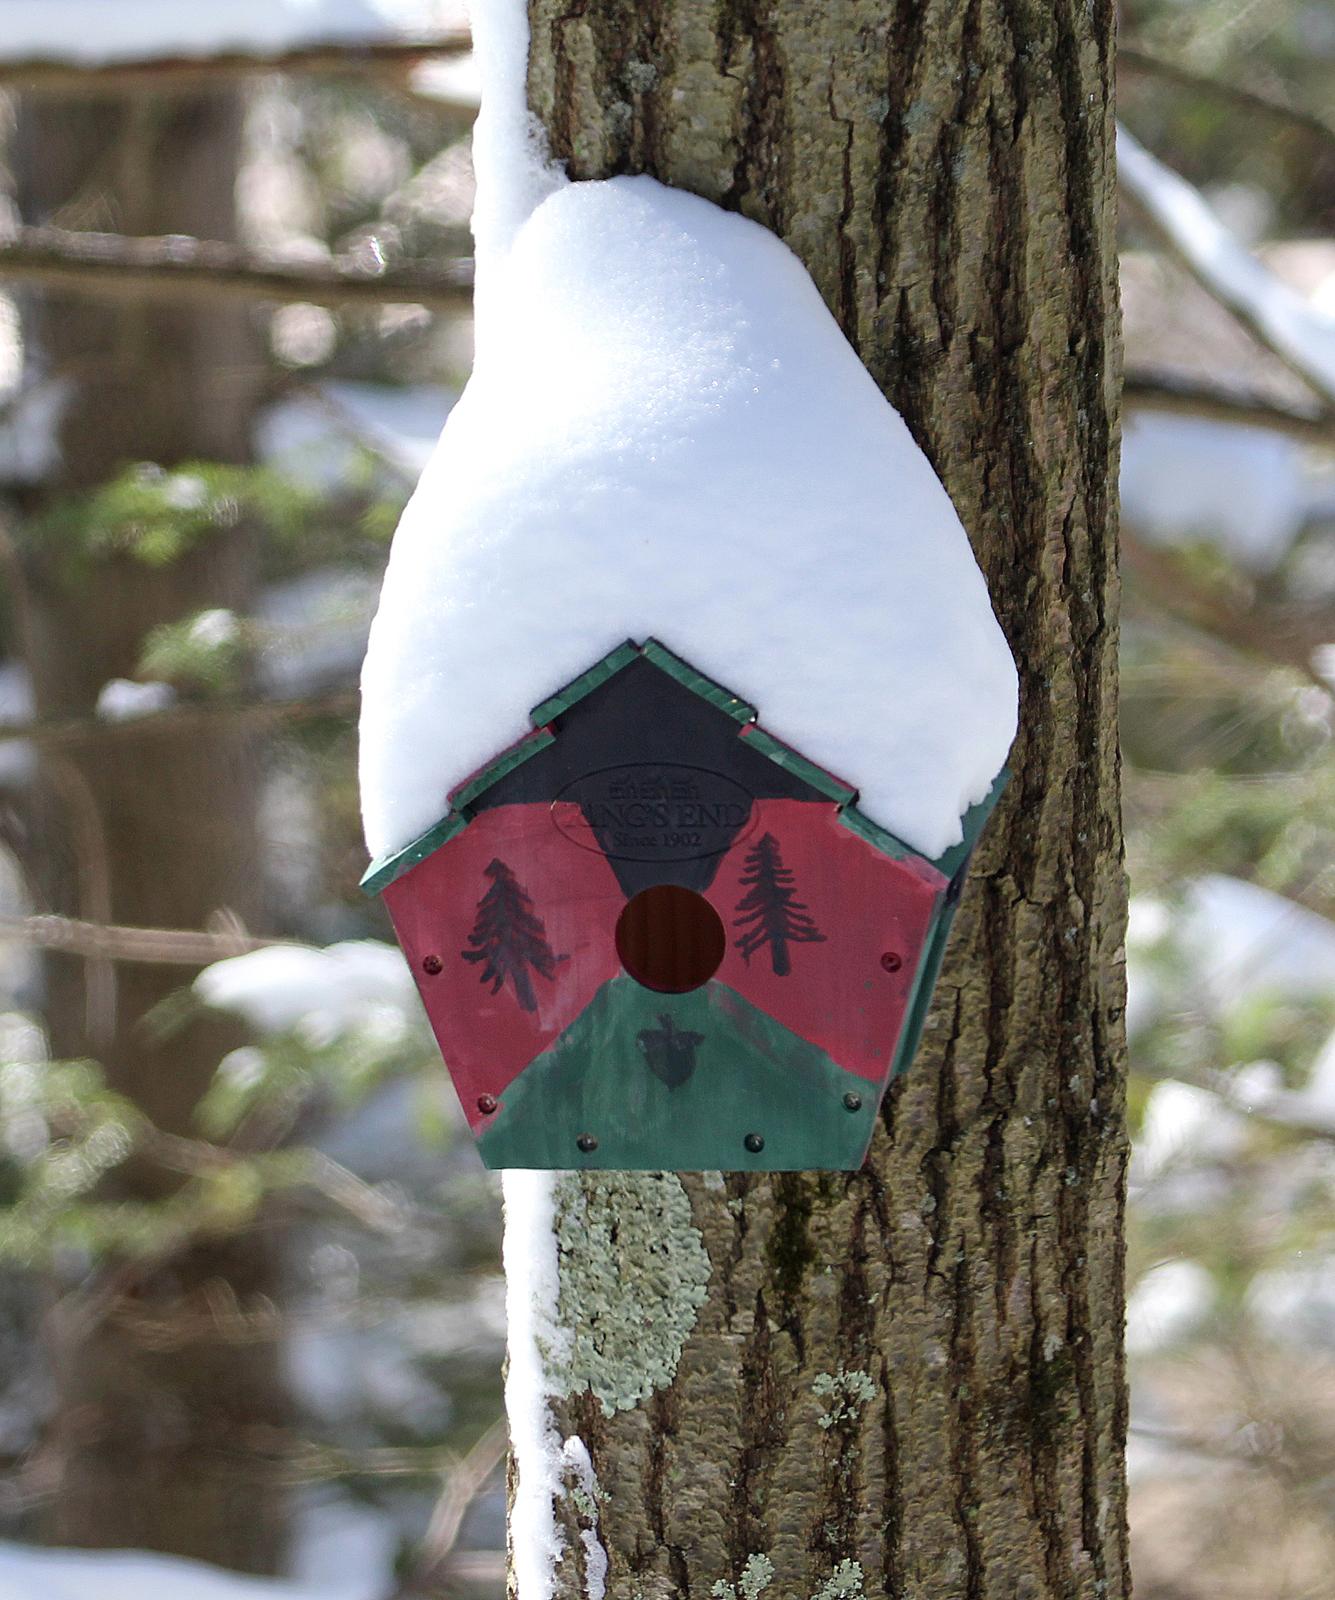 https://birdsofnewengland.files.wordpress.com/2016/02/birdhouse-snow.jpg